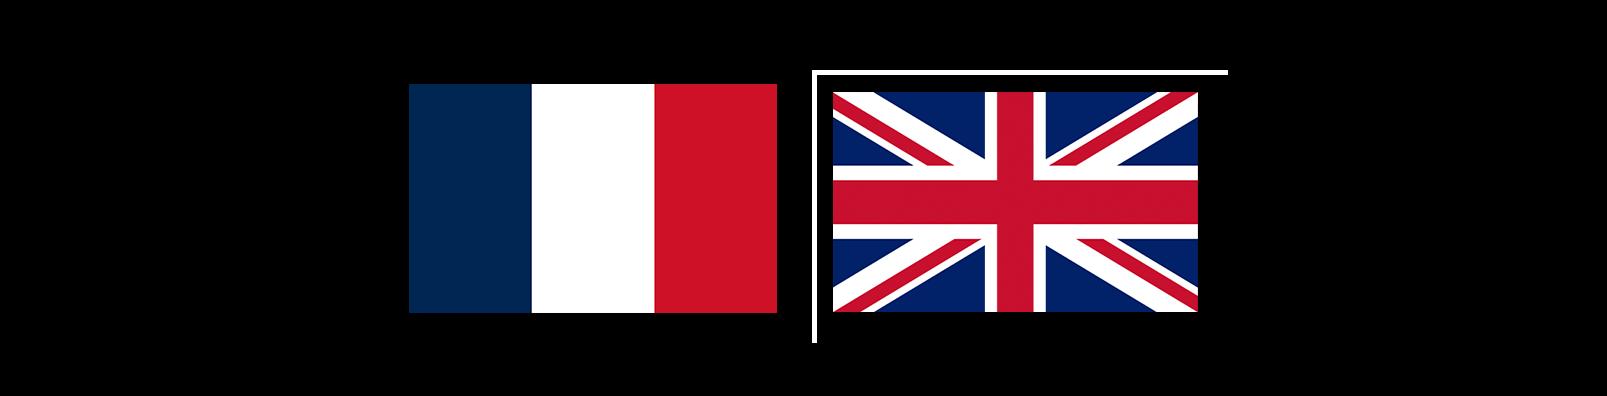 Flags Uk France